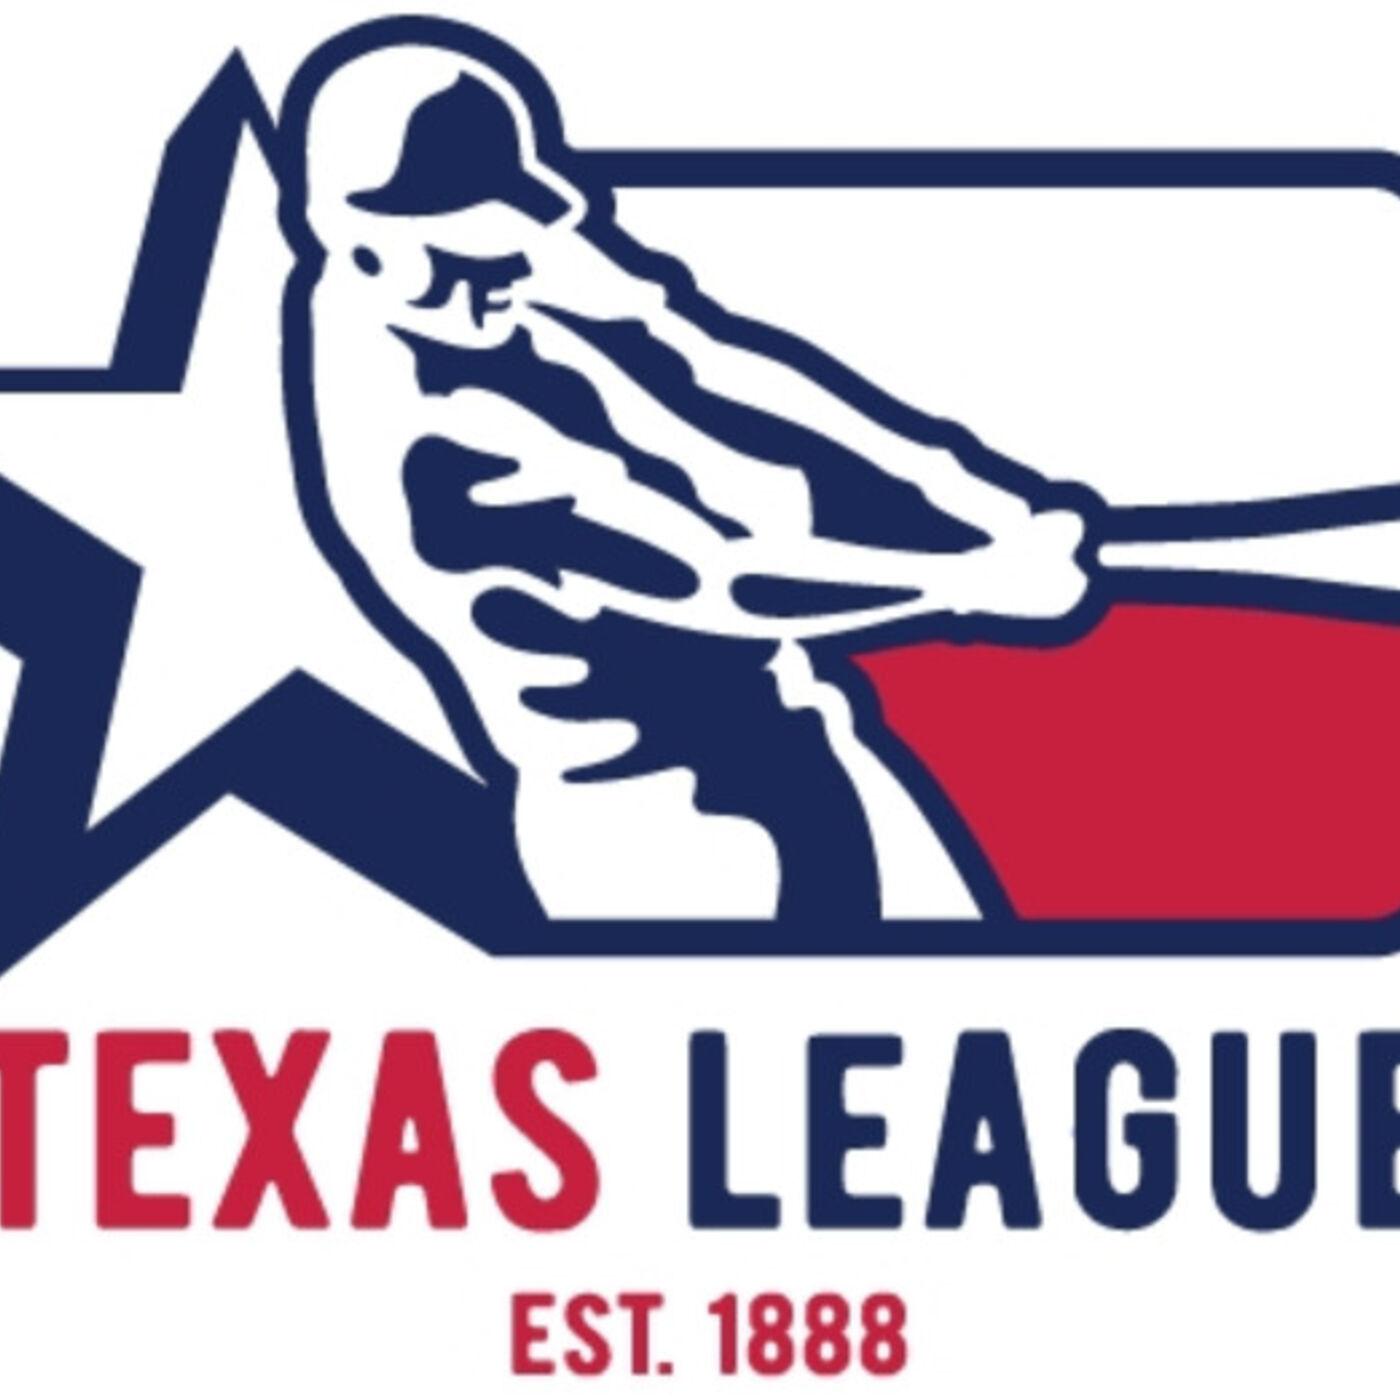 OFF/Ep 4 - Major changes ahead for Minor League Baseball